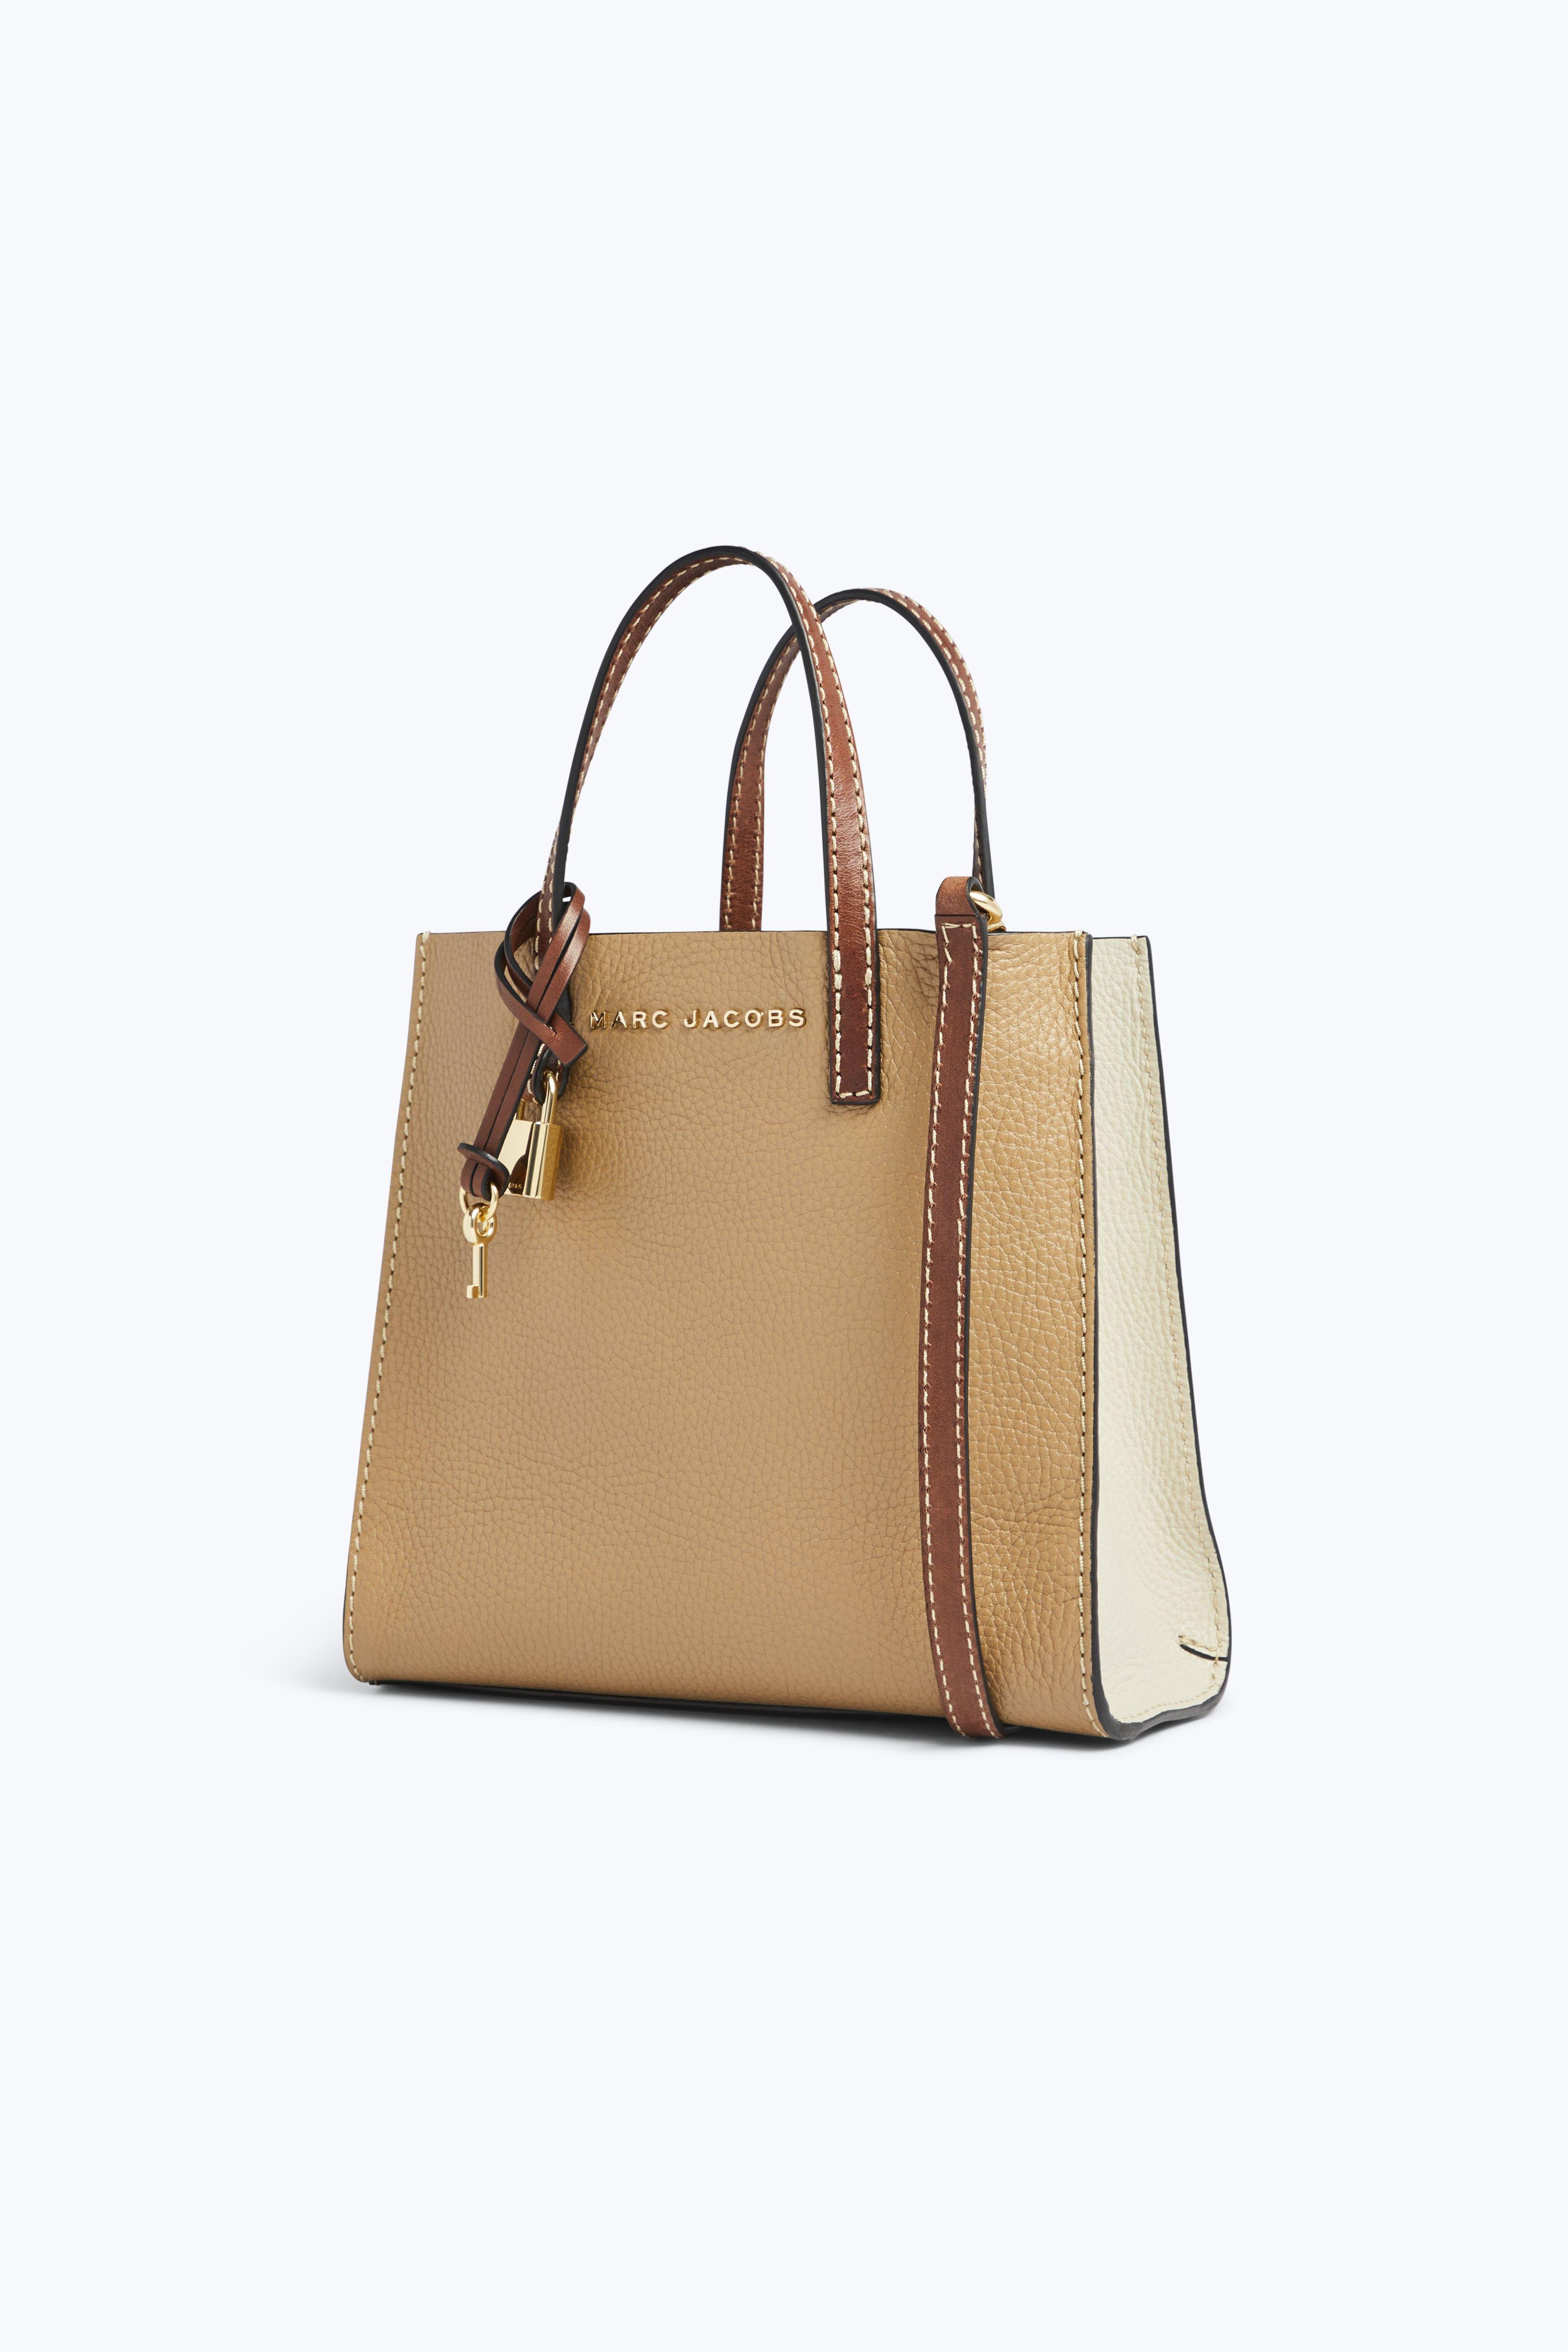 The Colorblock Mini Grind Bag